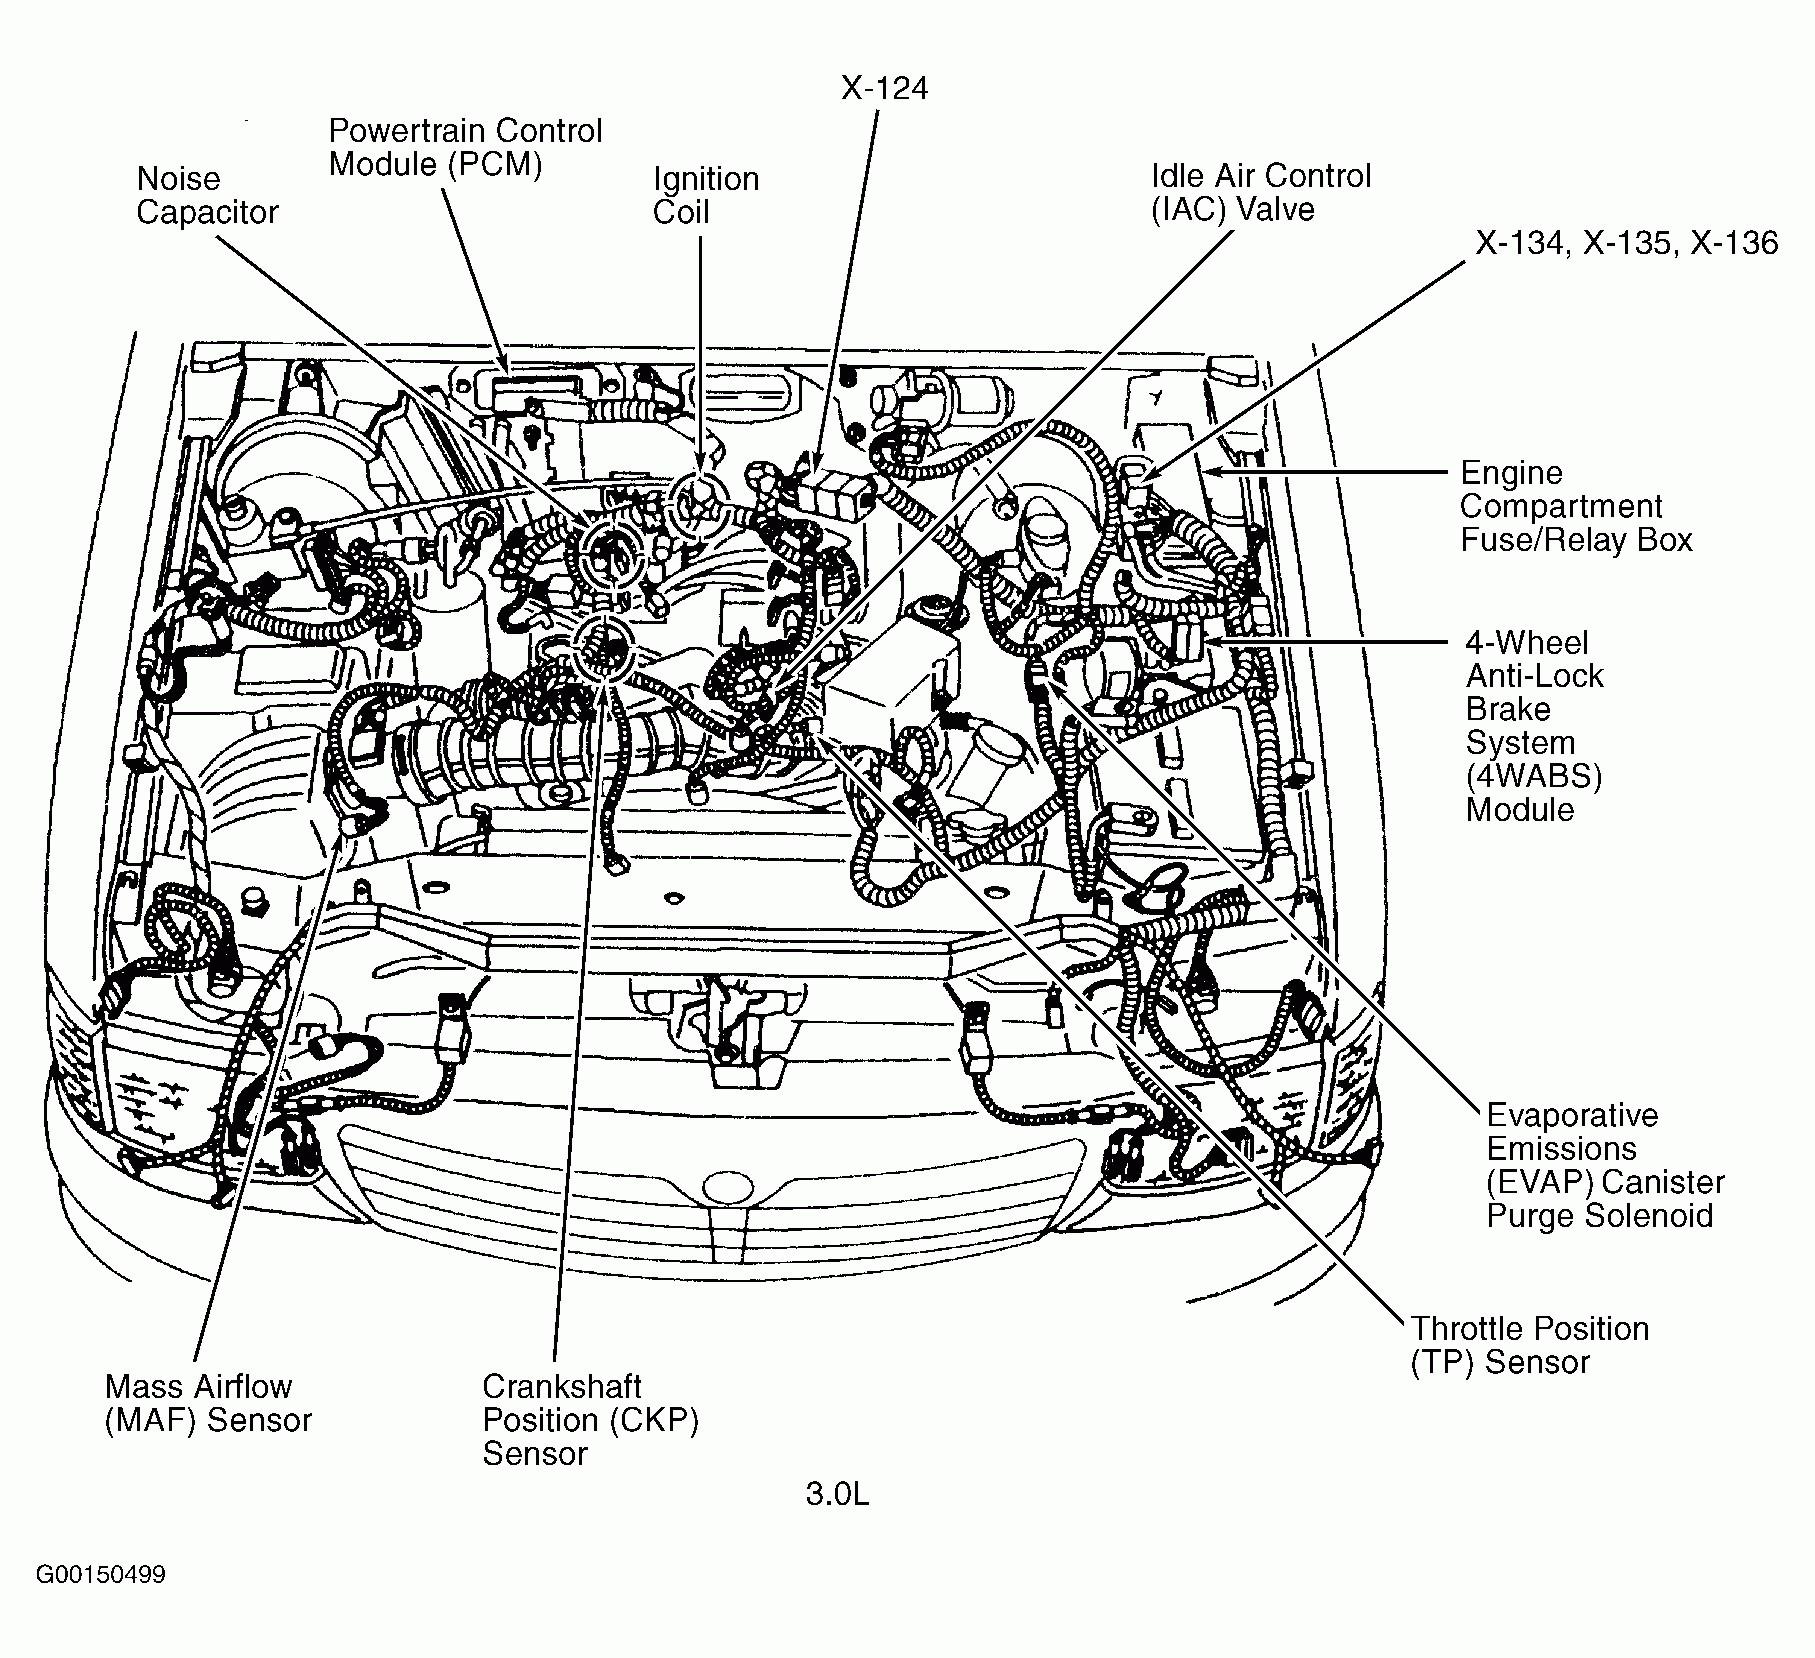 Vw 1 8 T Engine Diagram 2 Mazda 6 Engine Diagram Data Schematics Wiring Diagram • Of Vw 1 8 T Engine Diagram 2